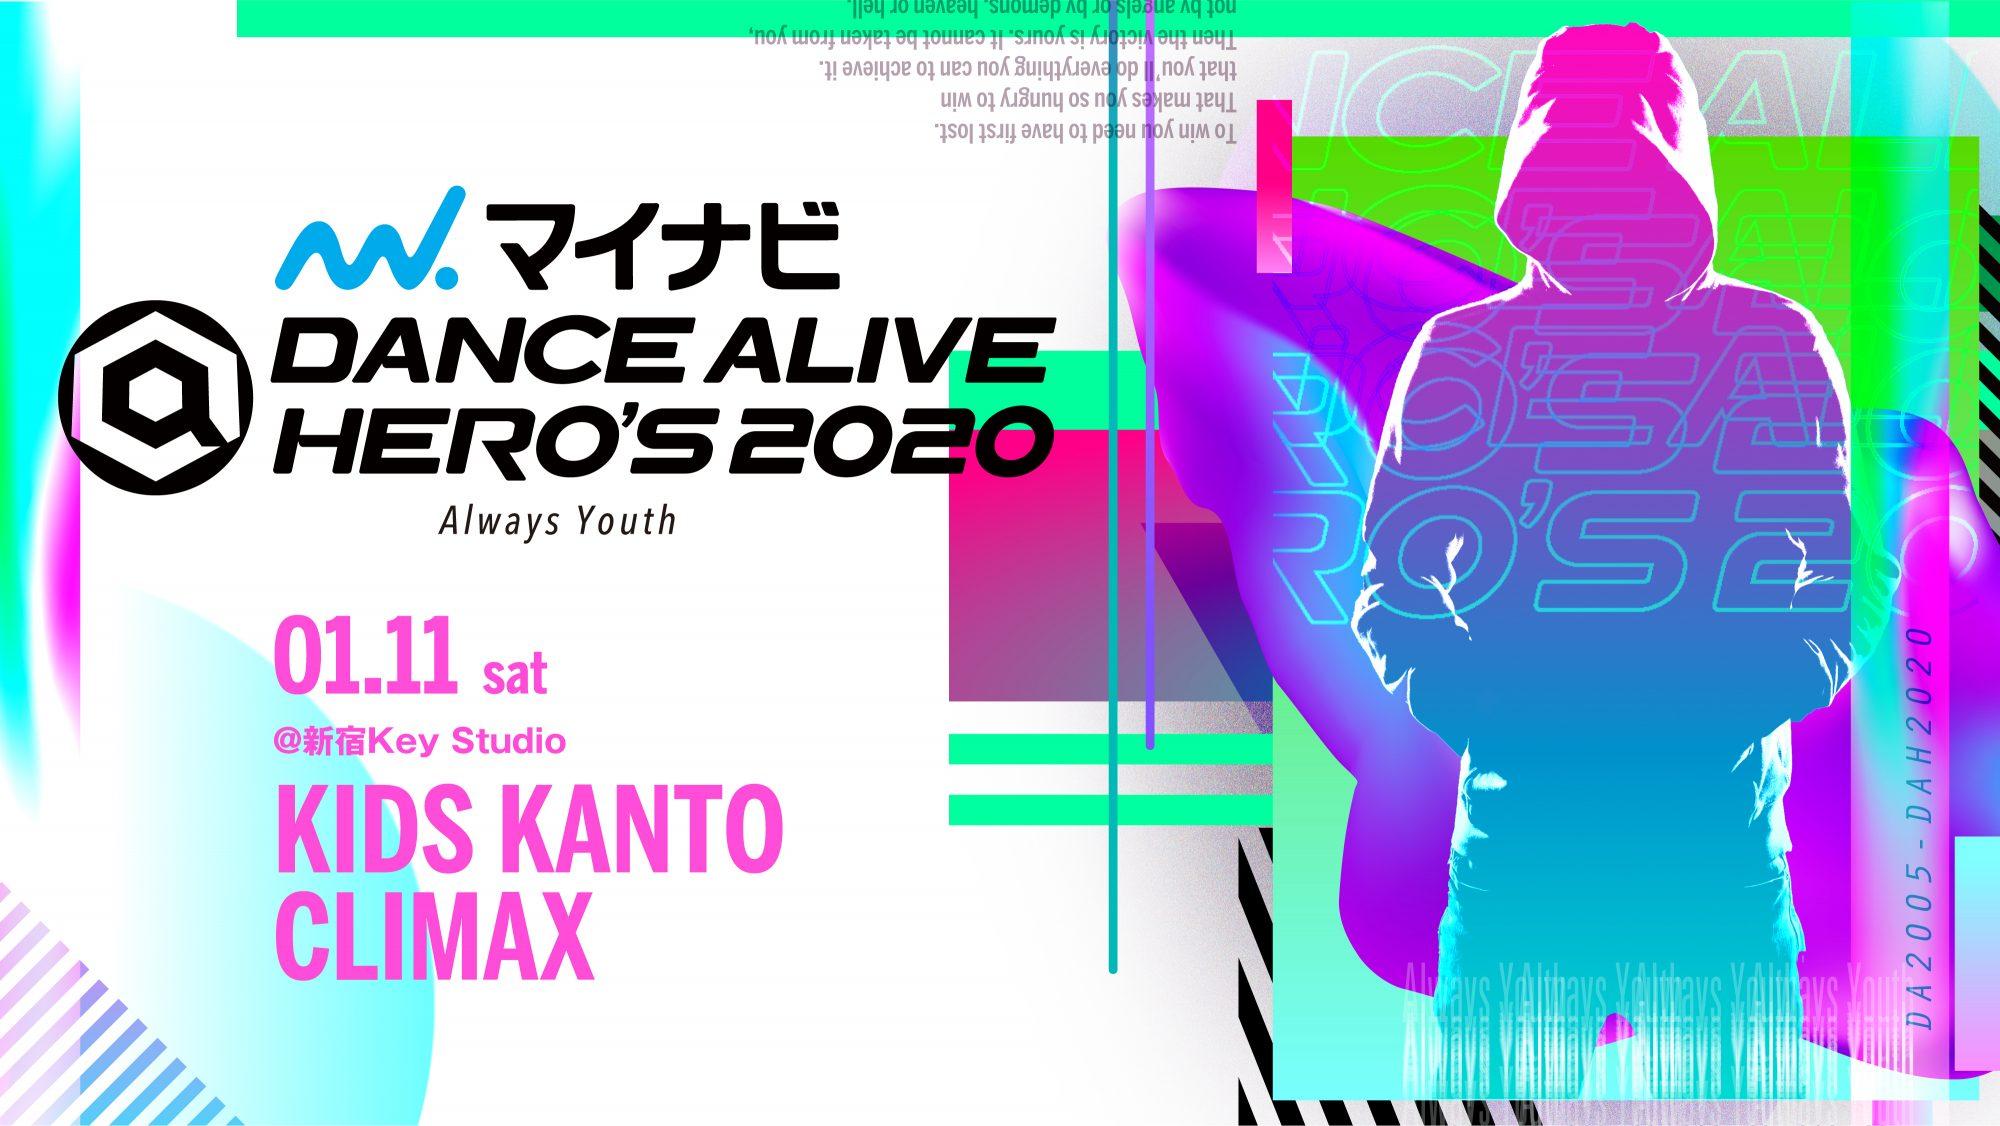 KIDS KANTO CLIMAXが1/11(土)に「新宿アルタ KeyStudio」で開催!